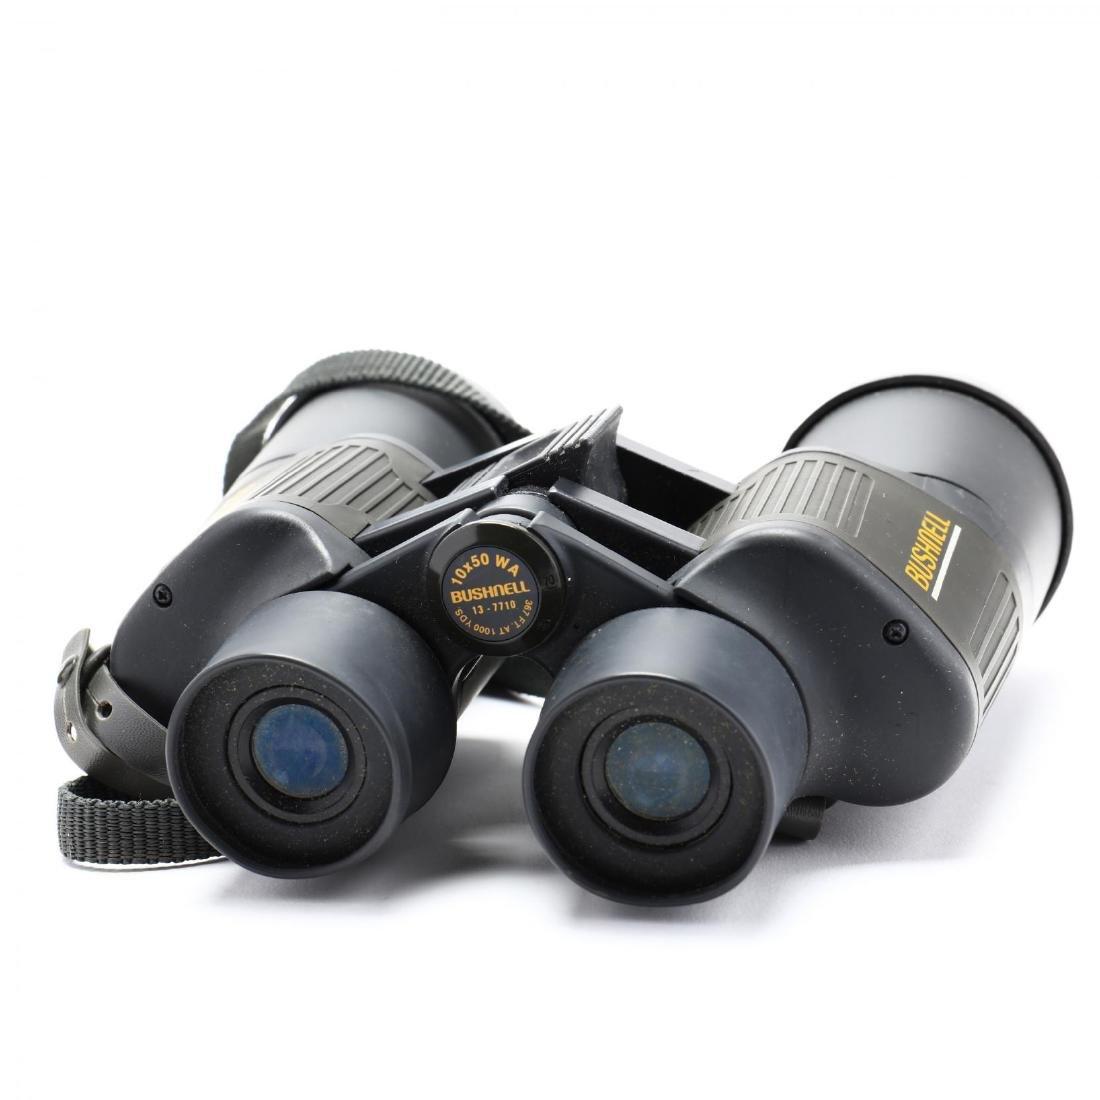 Two Pairs of Bushnell Binoculars - 5